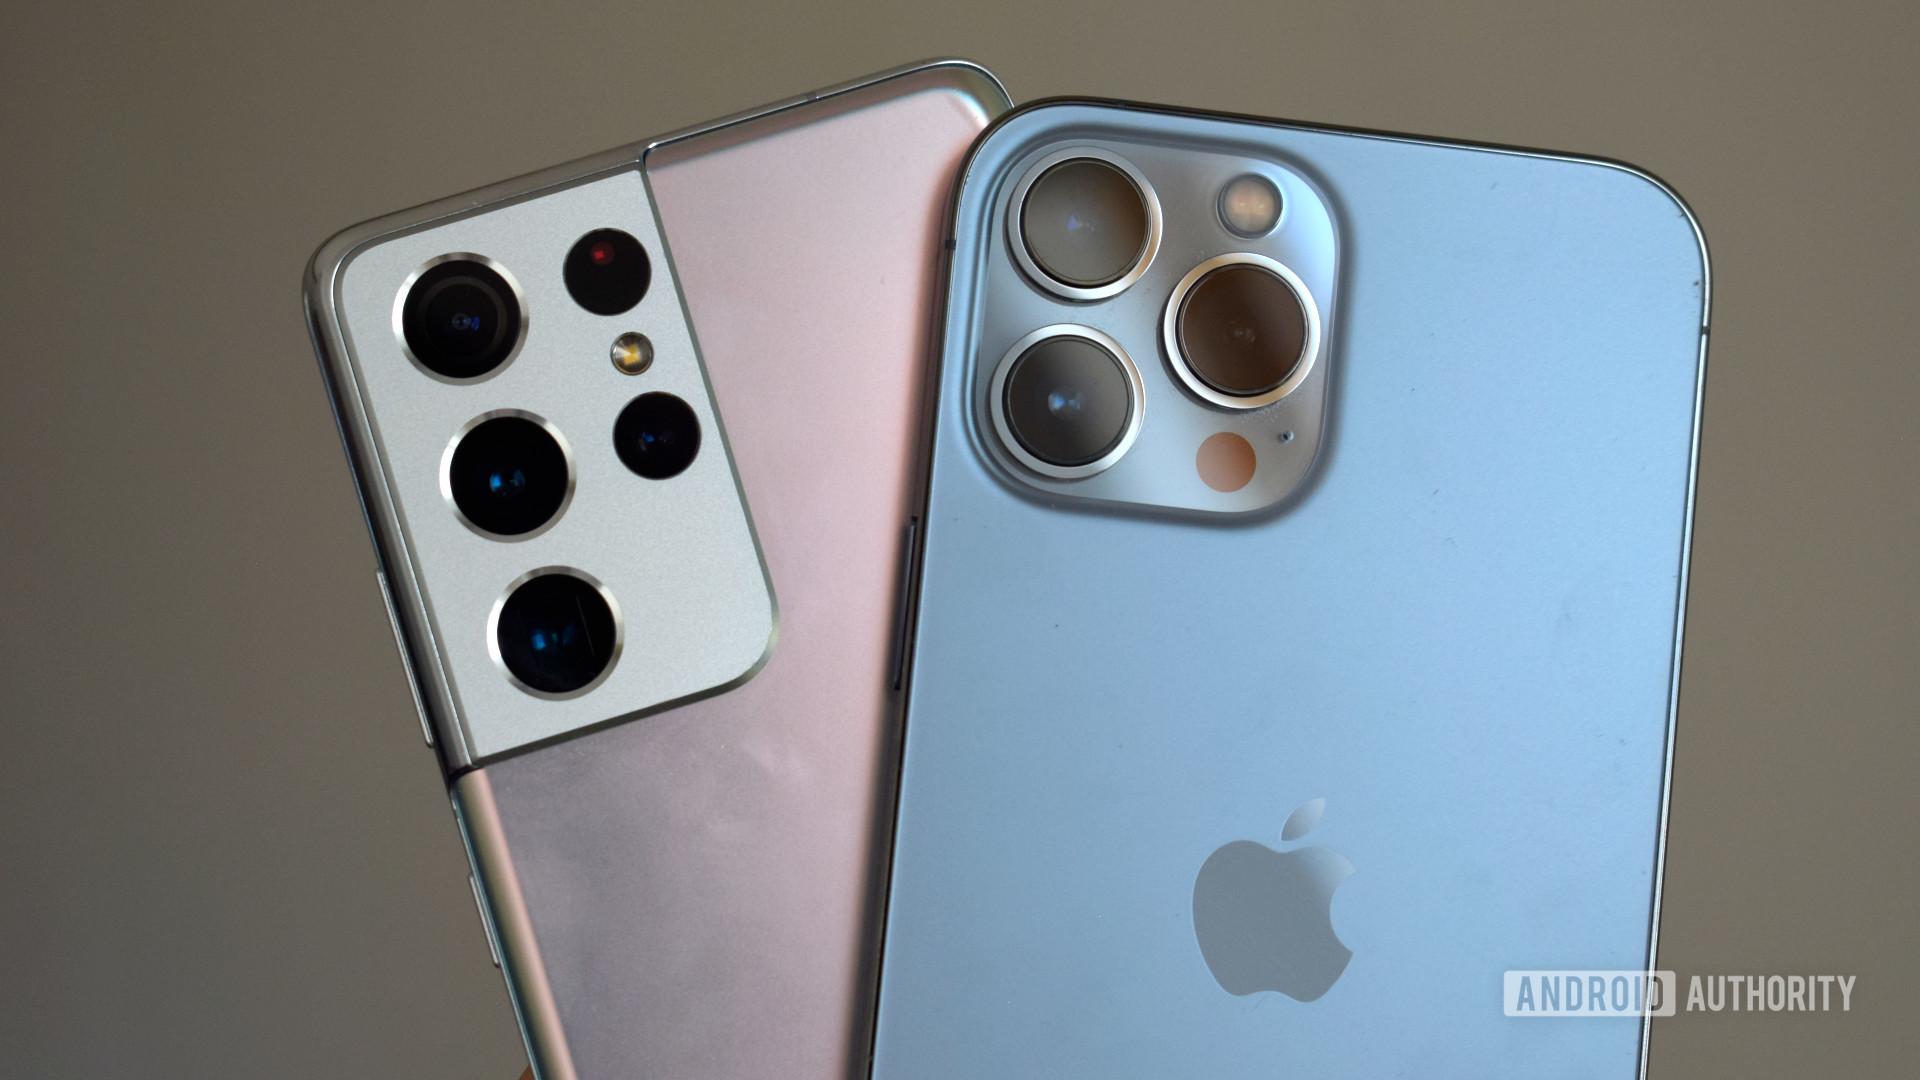 Apple iPhone 13 Pro Max vs Samsung Galaxy S21 Ultra cameras